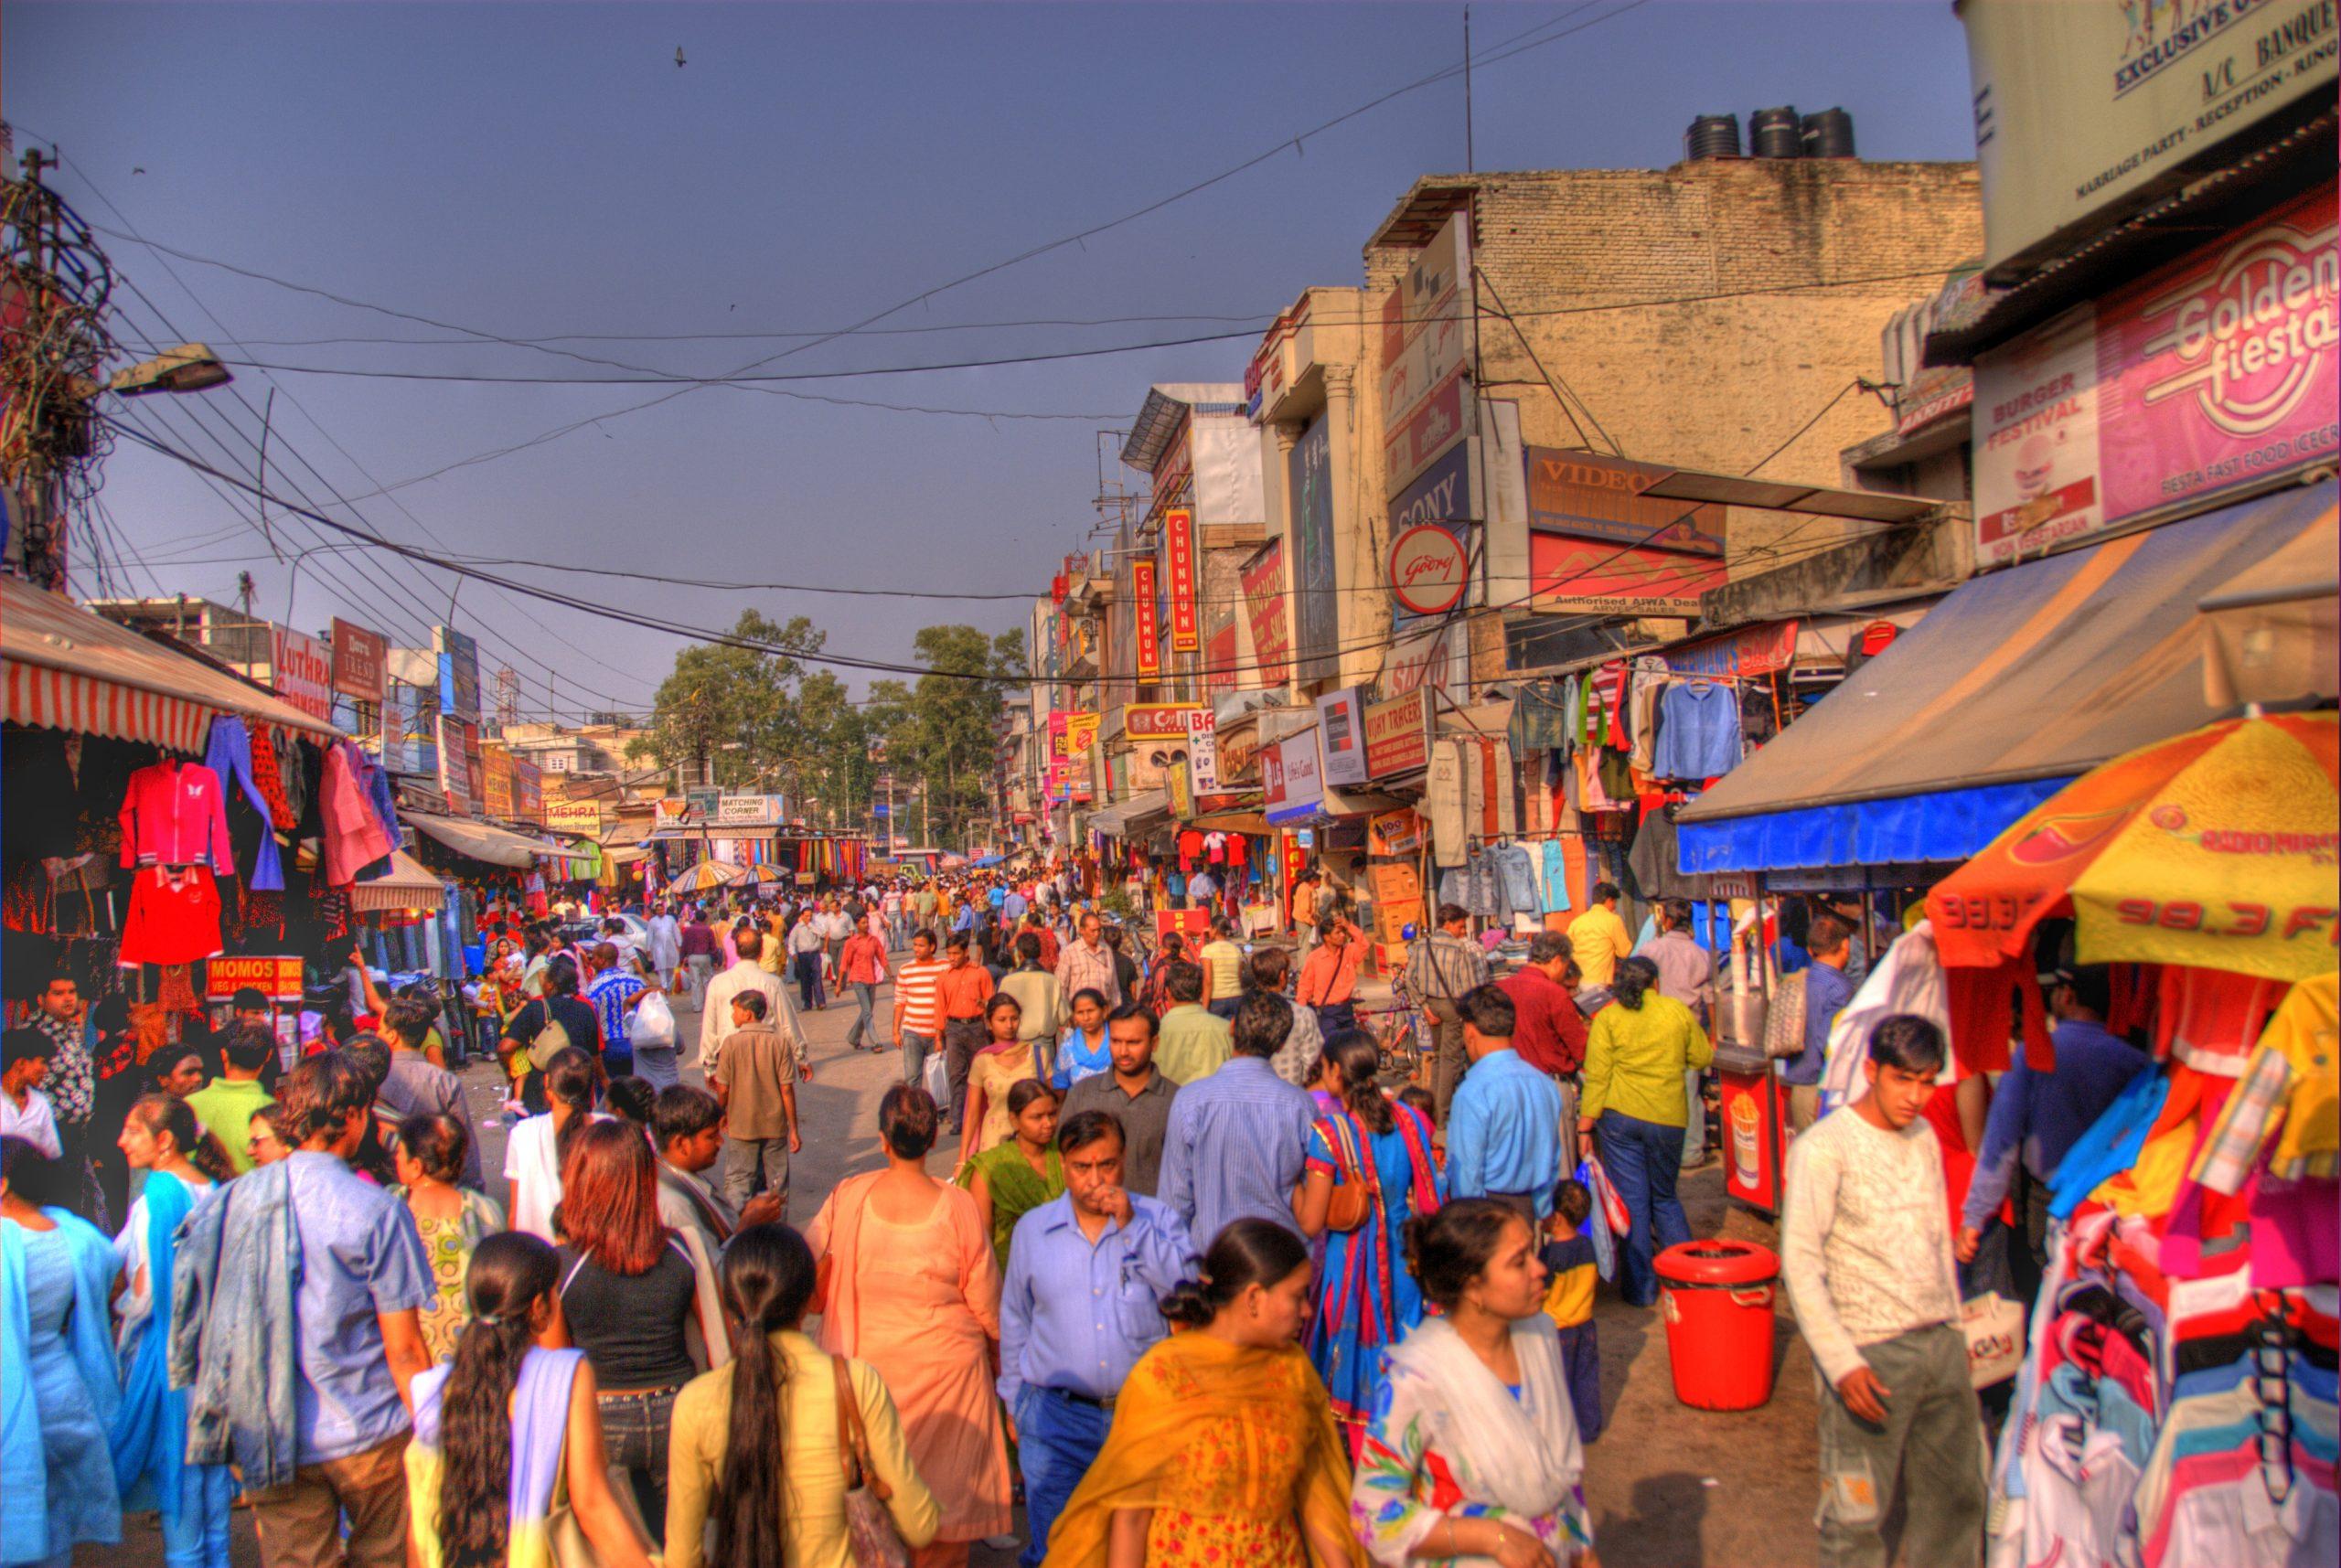 Central Market Amazing Market to Shop in Delhi